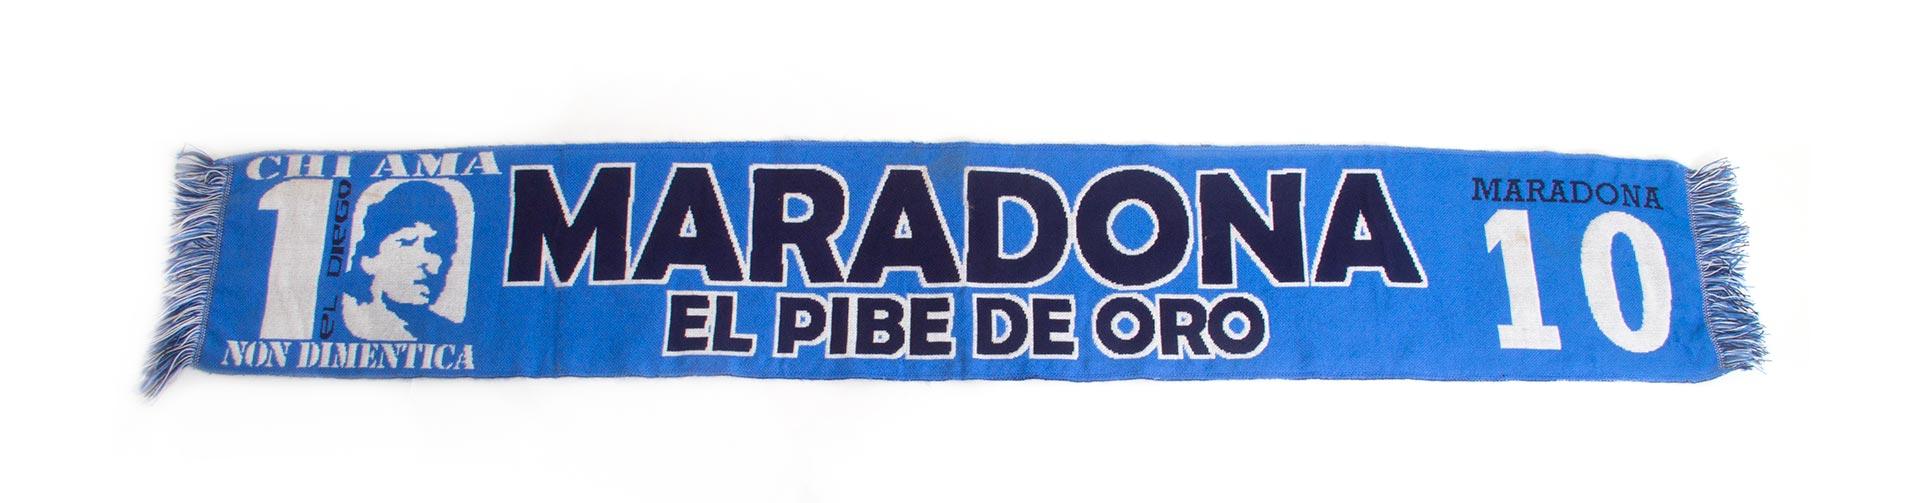 maradona_mundial_caja_9